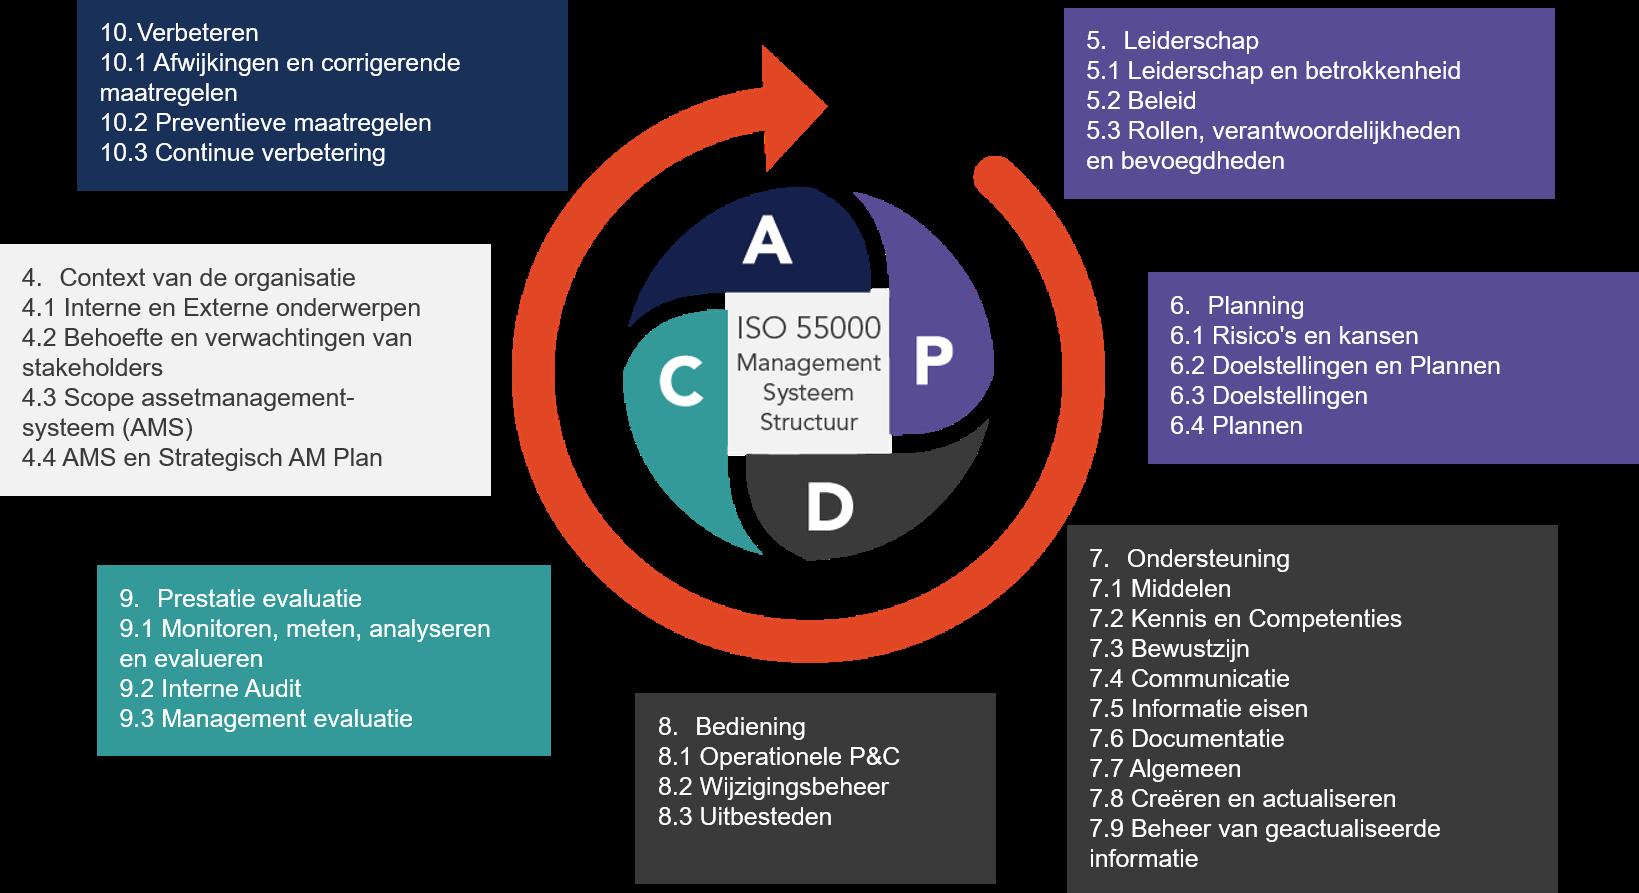 Plan Do Check Act cirkel voor ISO 55000